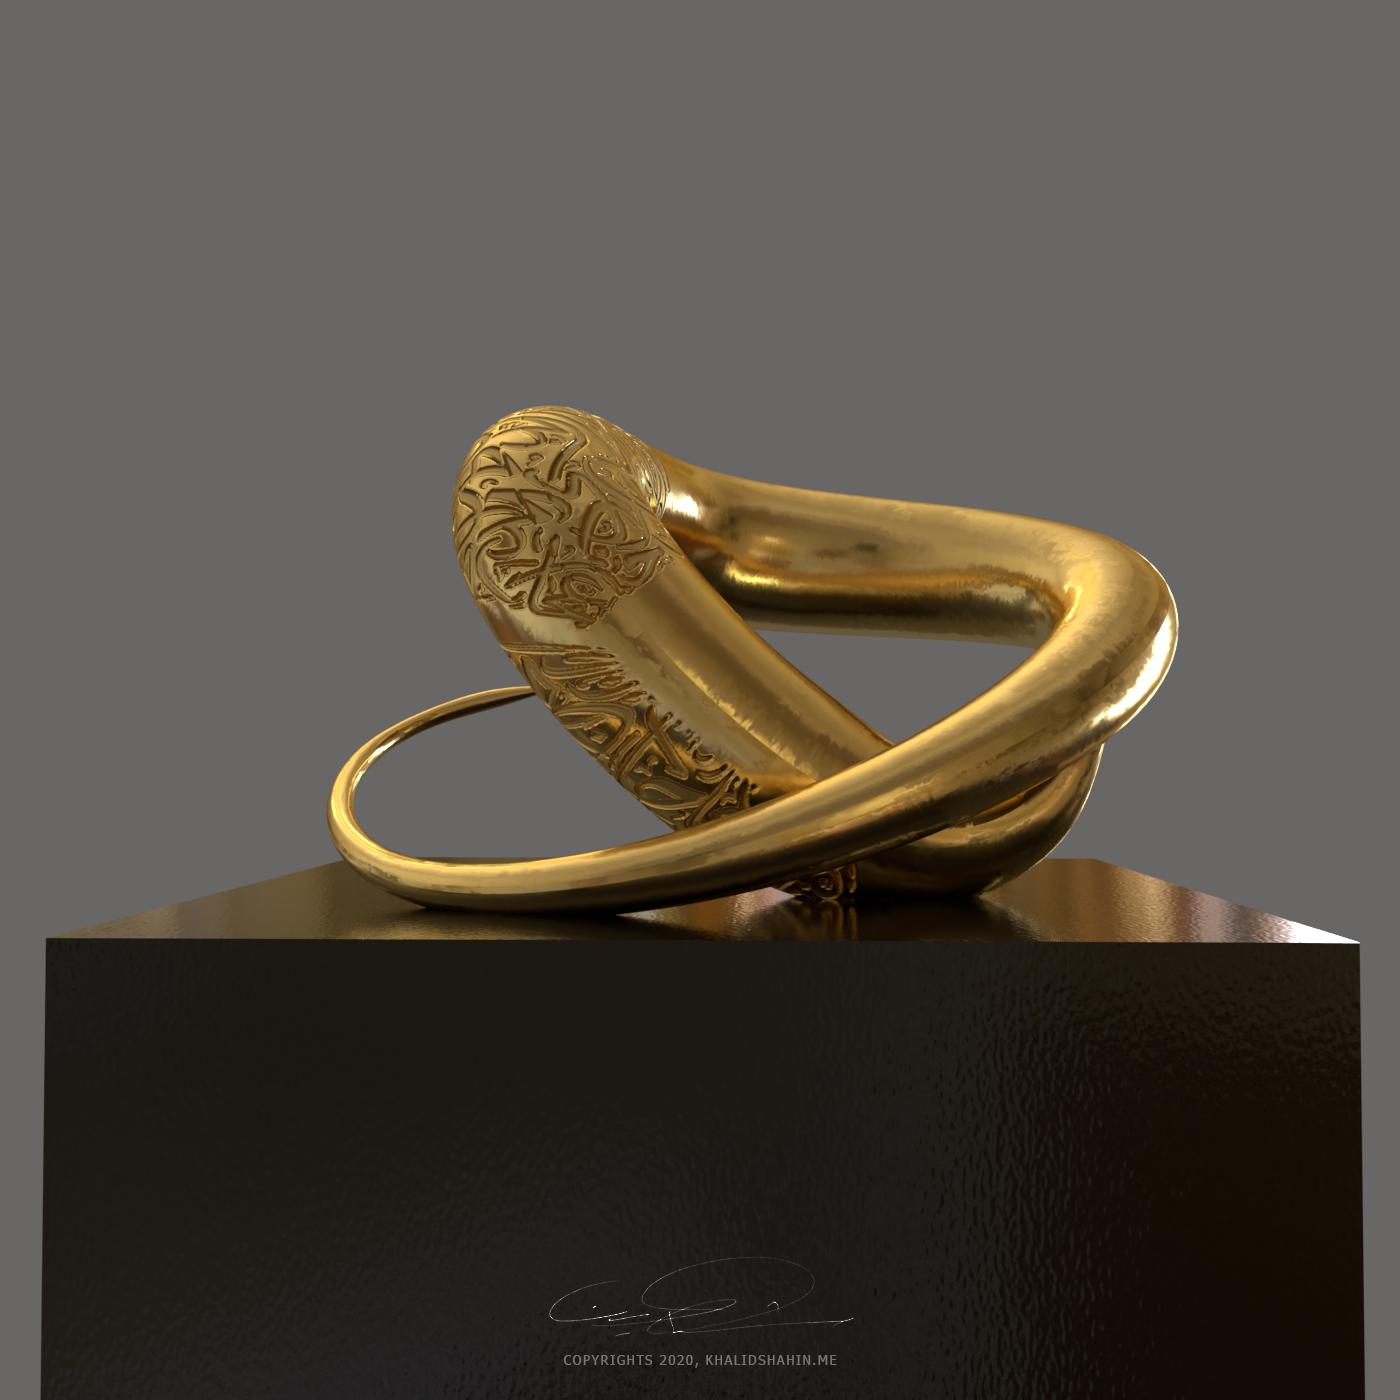 Contorto- sculpture work by Khalid Shahin